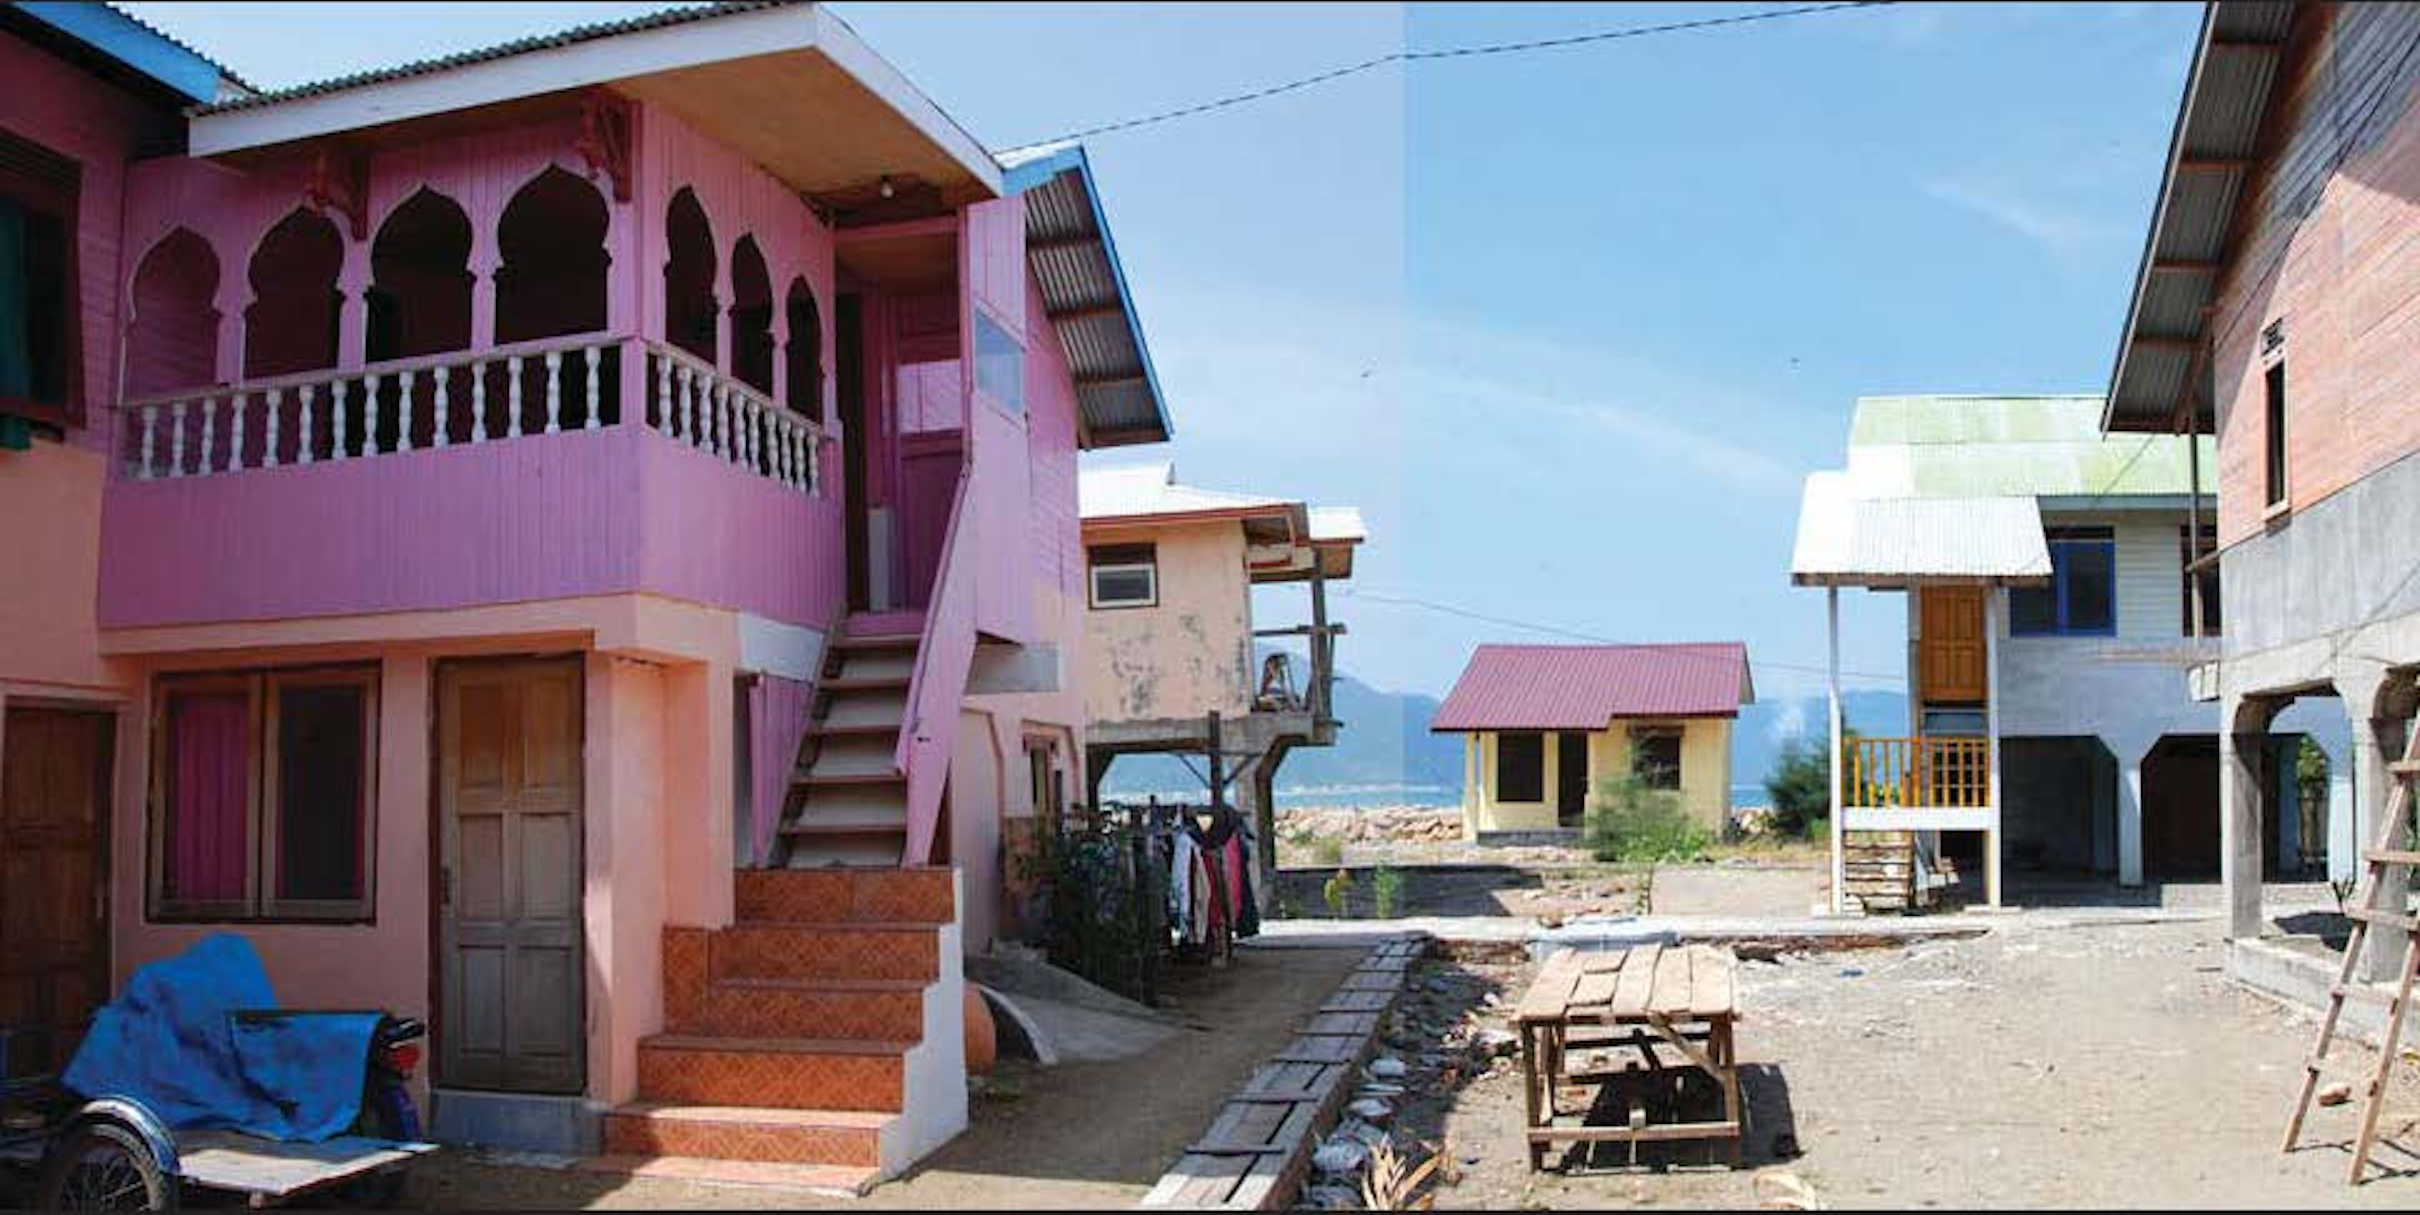 Banda Aceh Post-Tsunami Reconstruction (Banda Aceh, Indonesia)